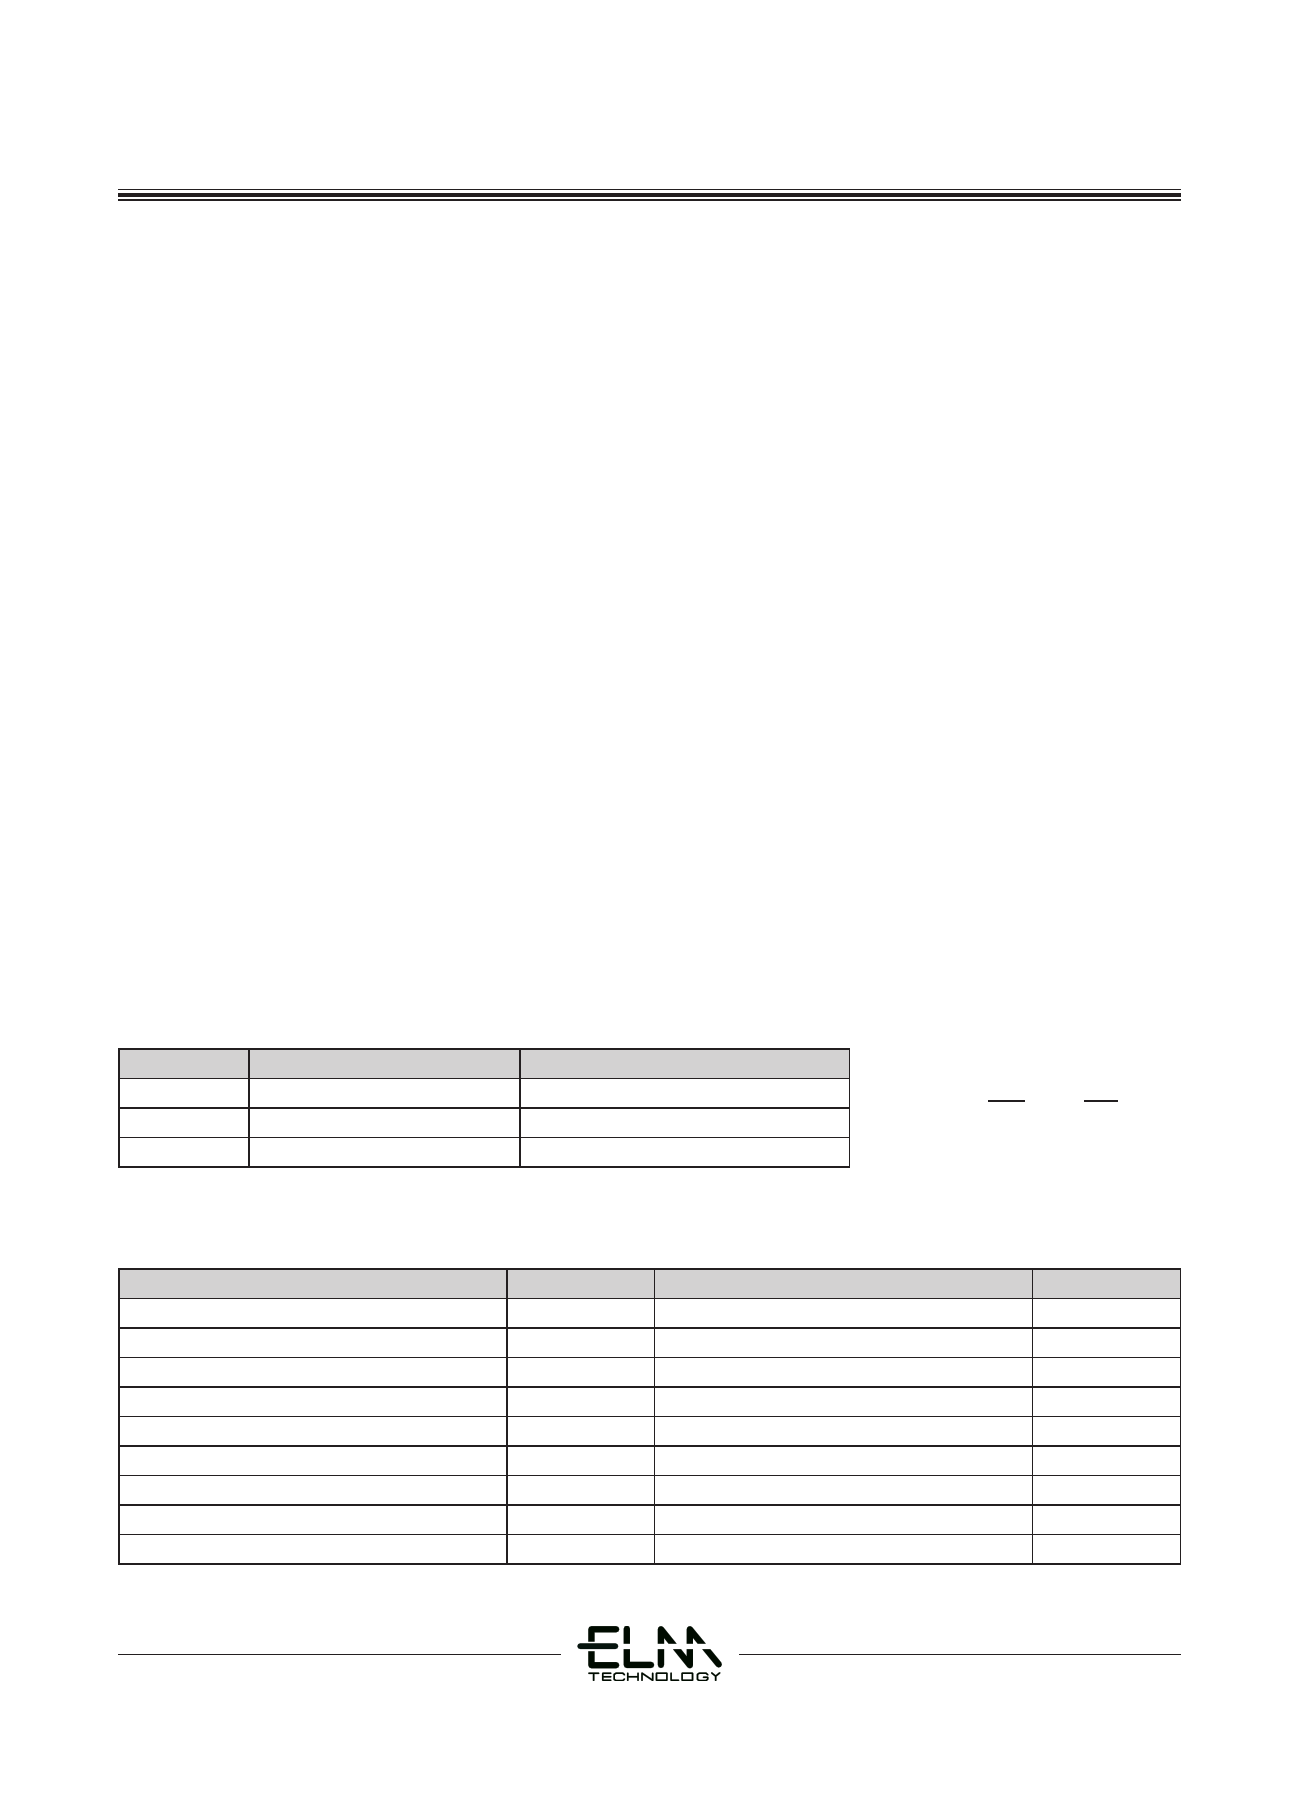 ELM7S14B Datasheet, ELM7S14B PDF,ピン配置, 機能